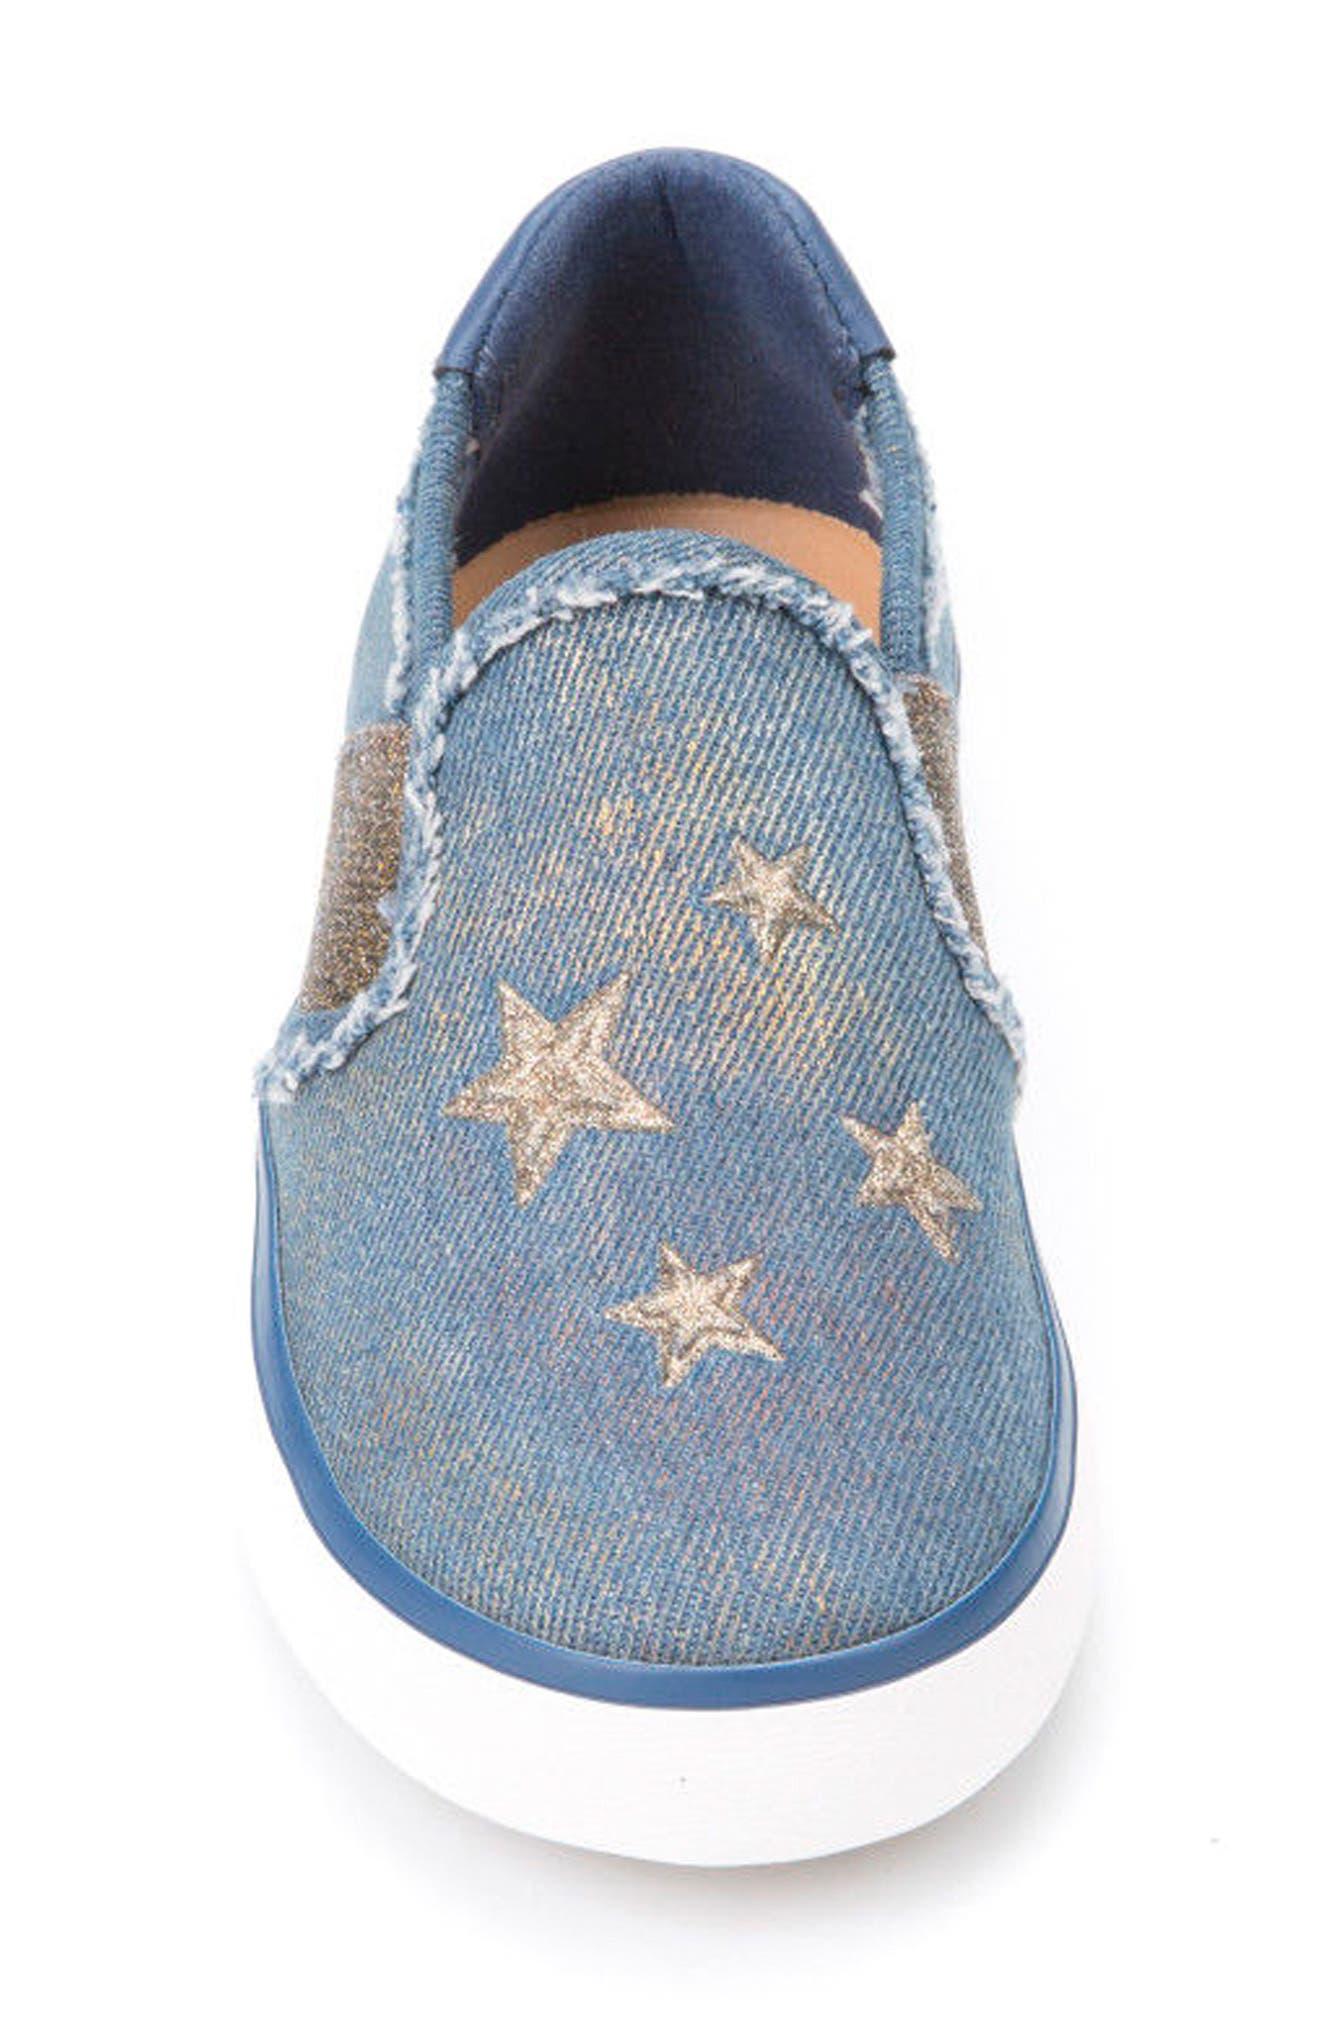 Kilwi Slip-On Sneaker,                             Alternate thumbnail 4, color,                             AVIO